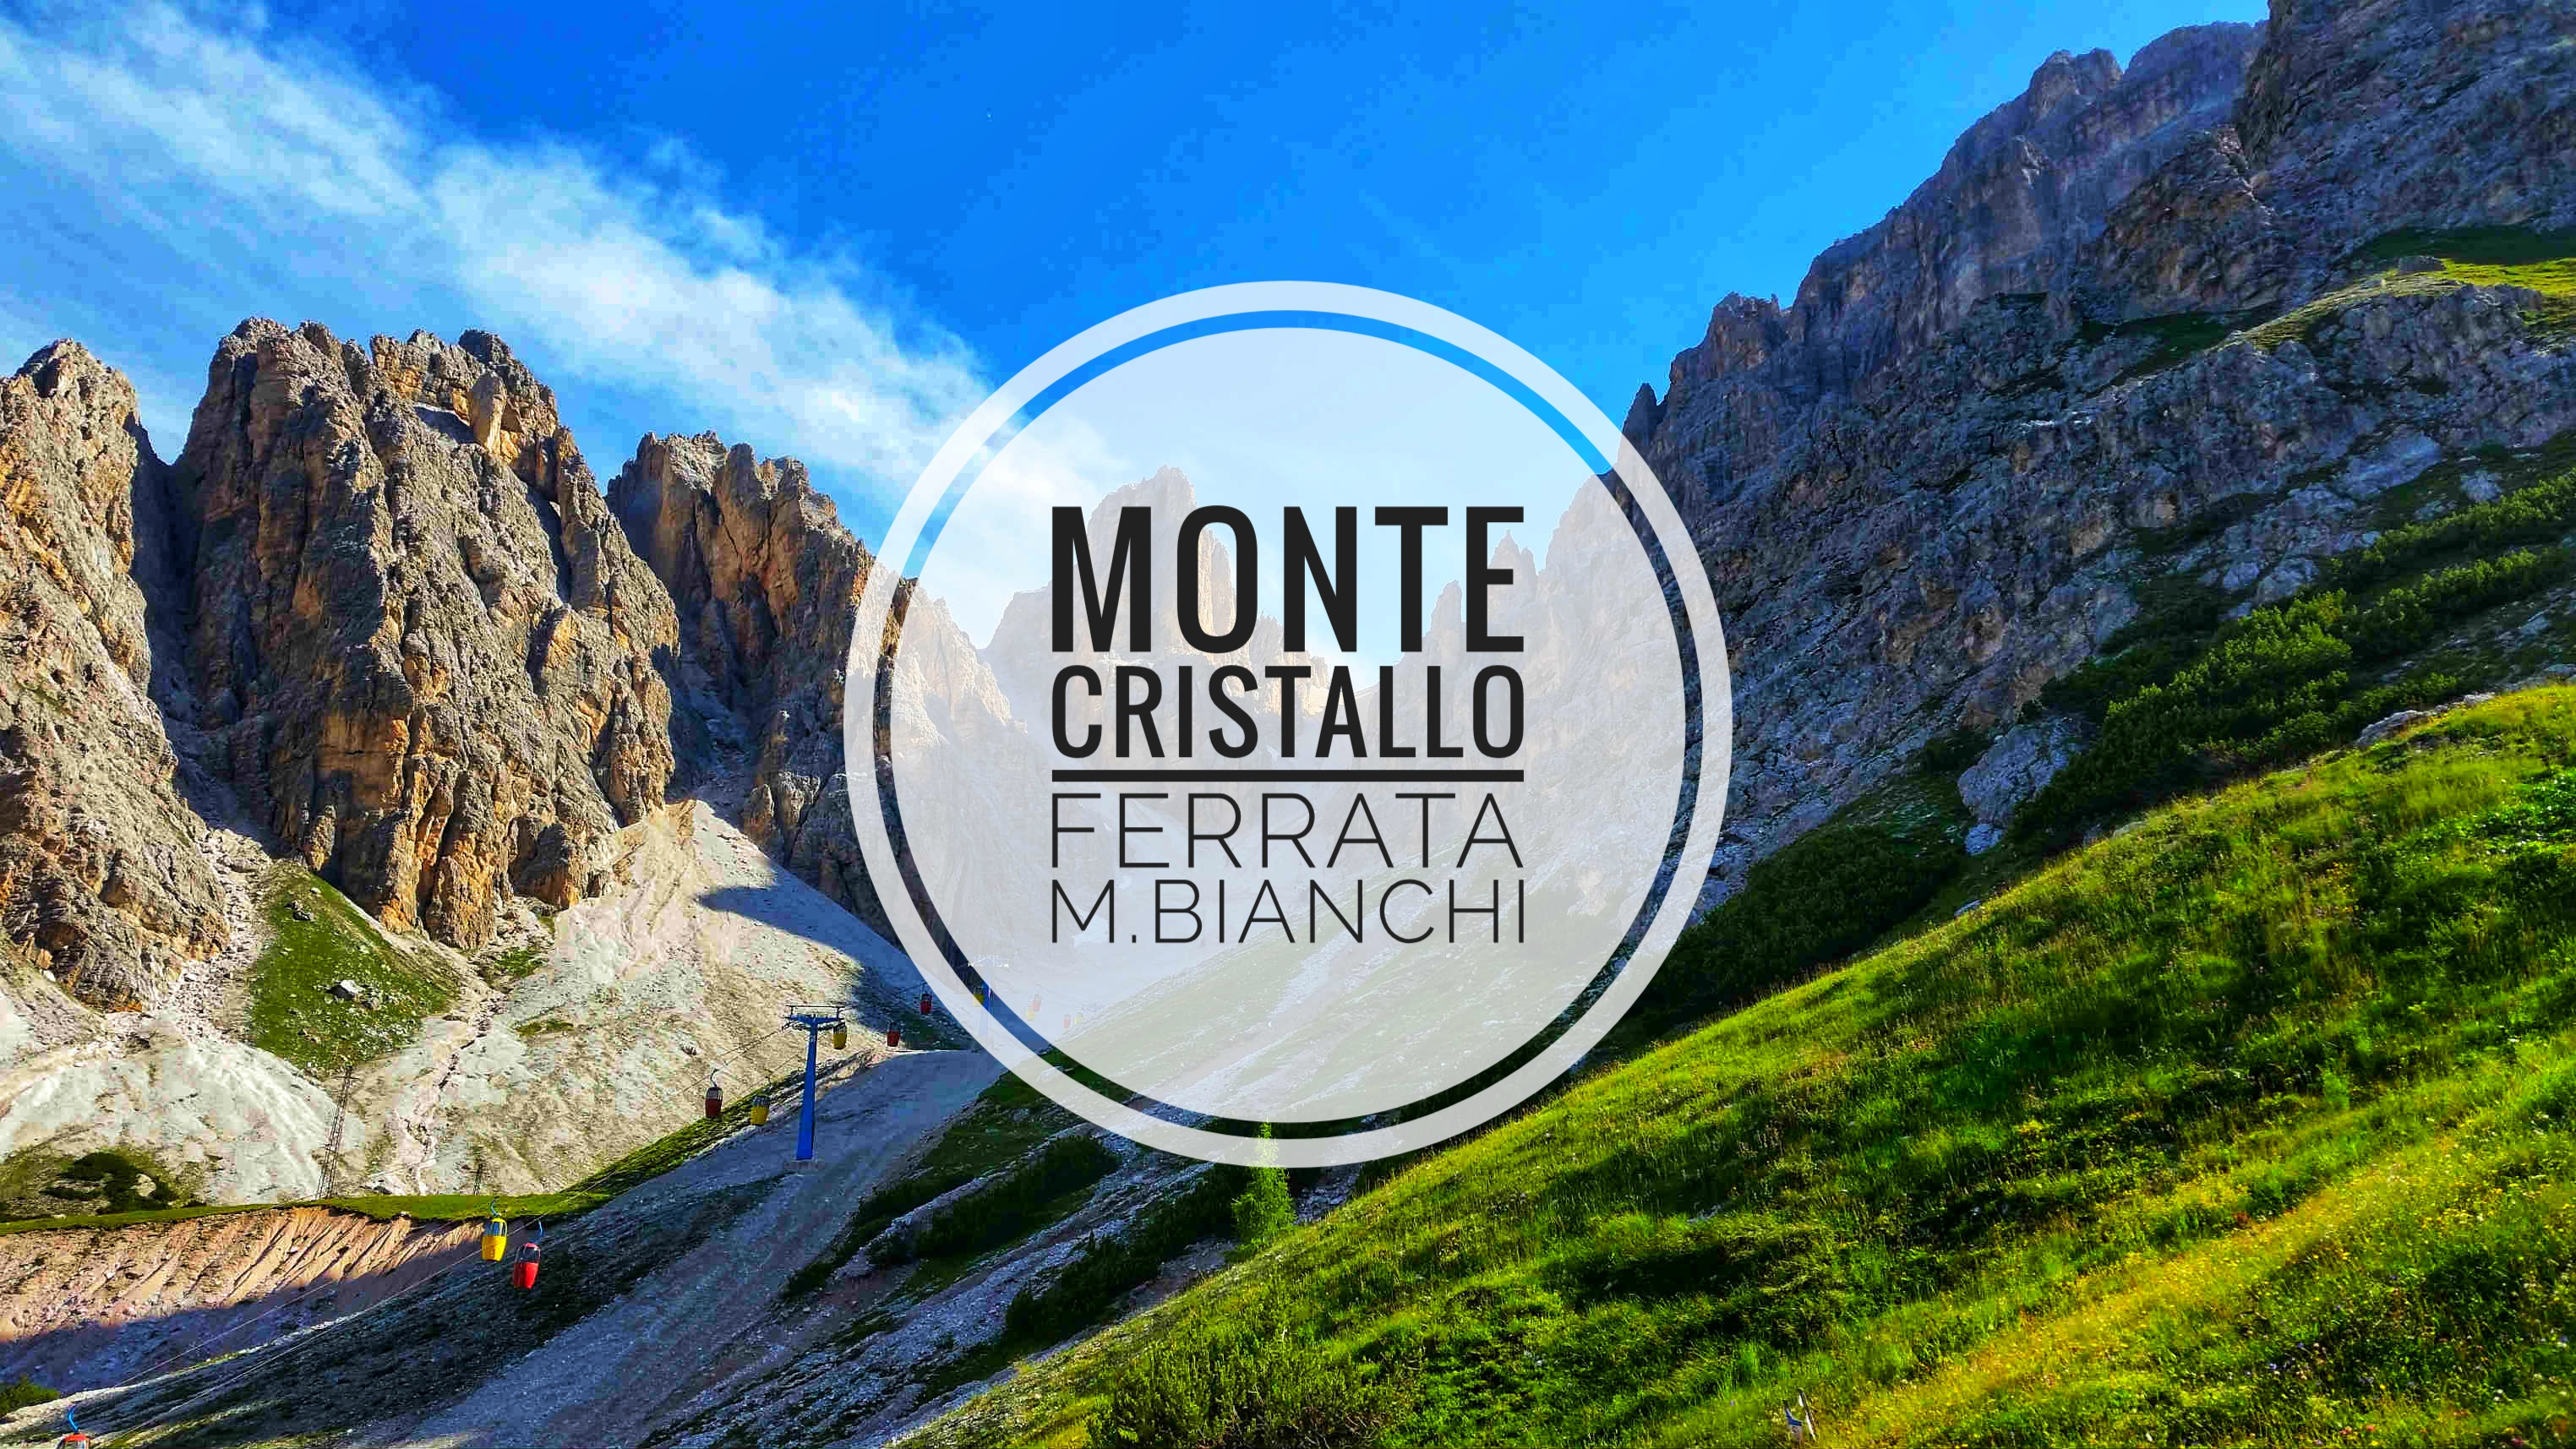 Monte Cristallo – Výstup ferratou M. Bianchi